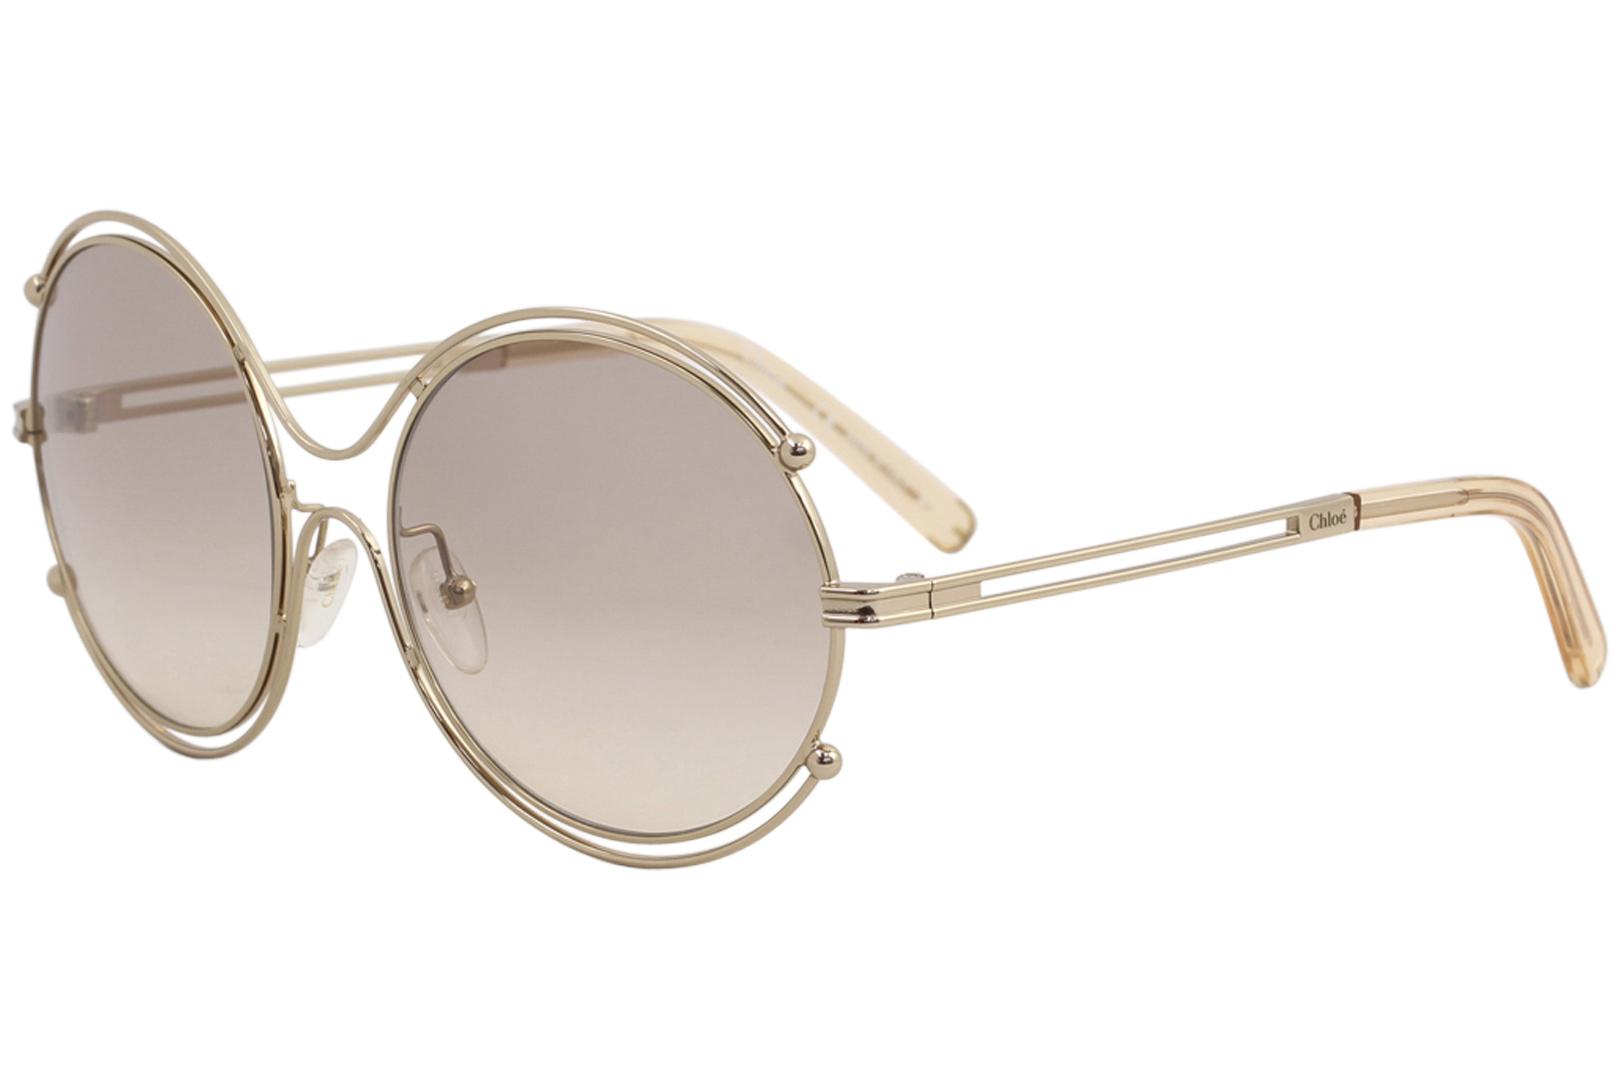 b64756d59540 Chloe Women s CE122S CE 122 S Rose Gold 785 Fashion Round Sunglasses ...